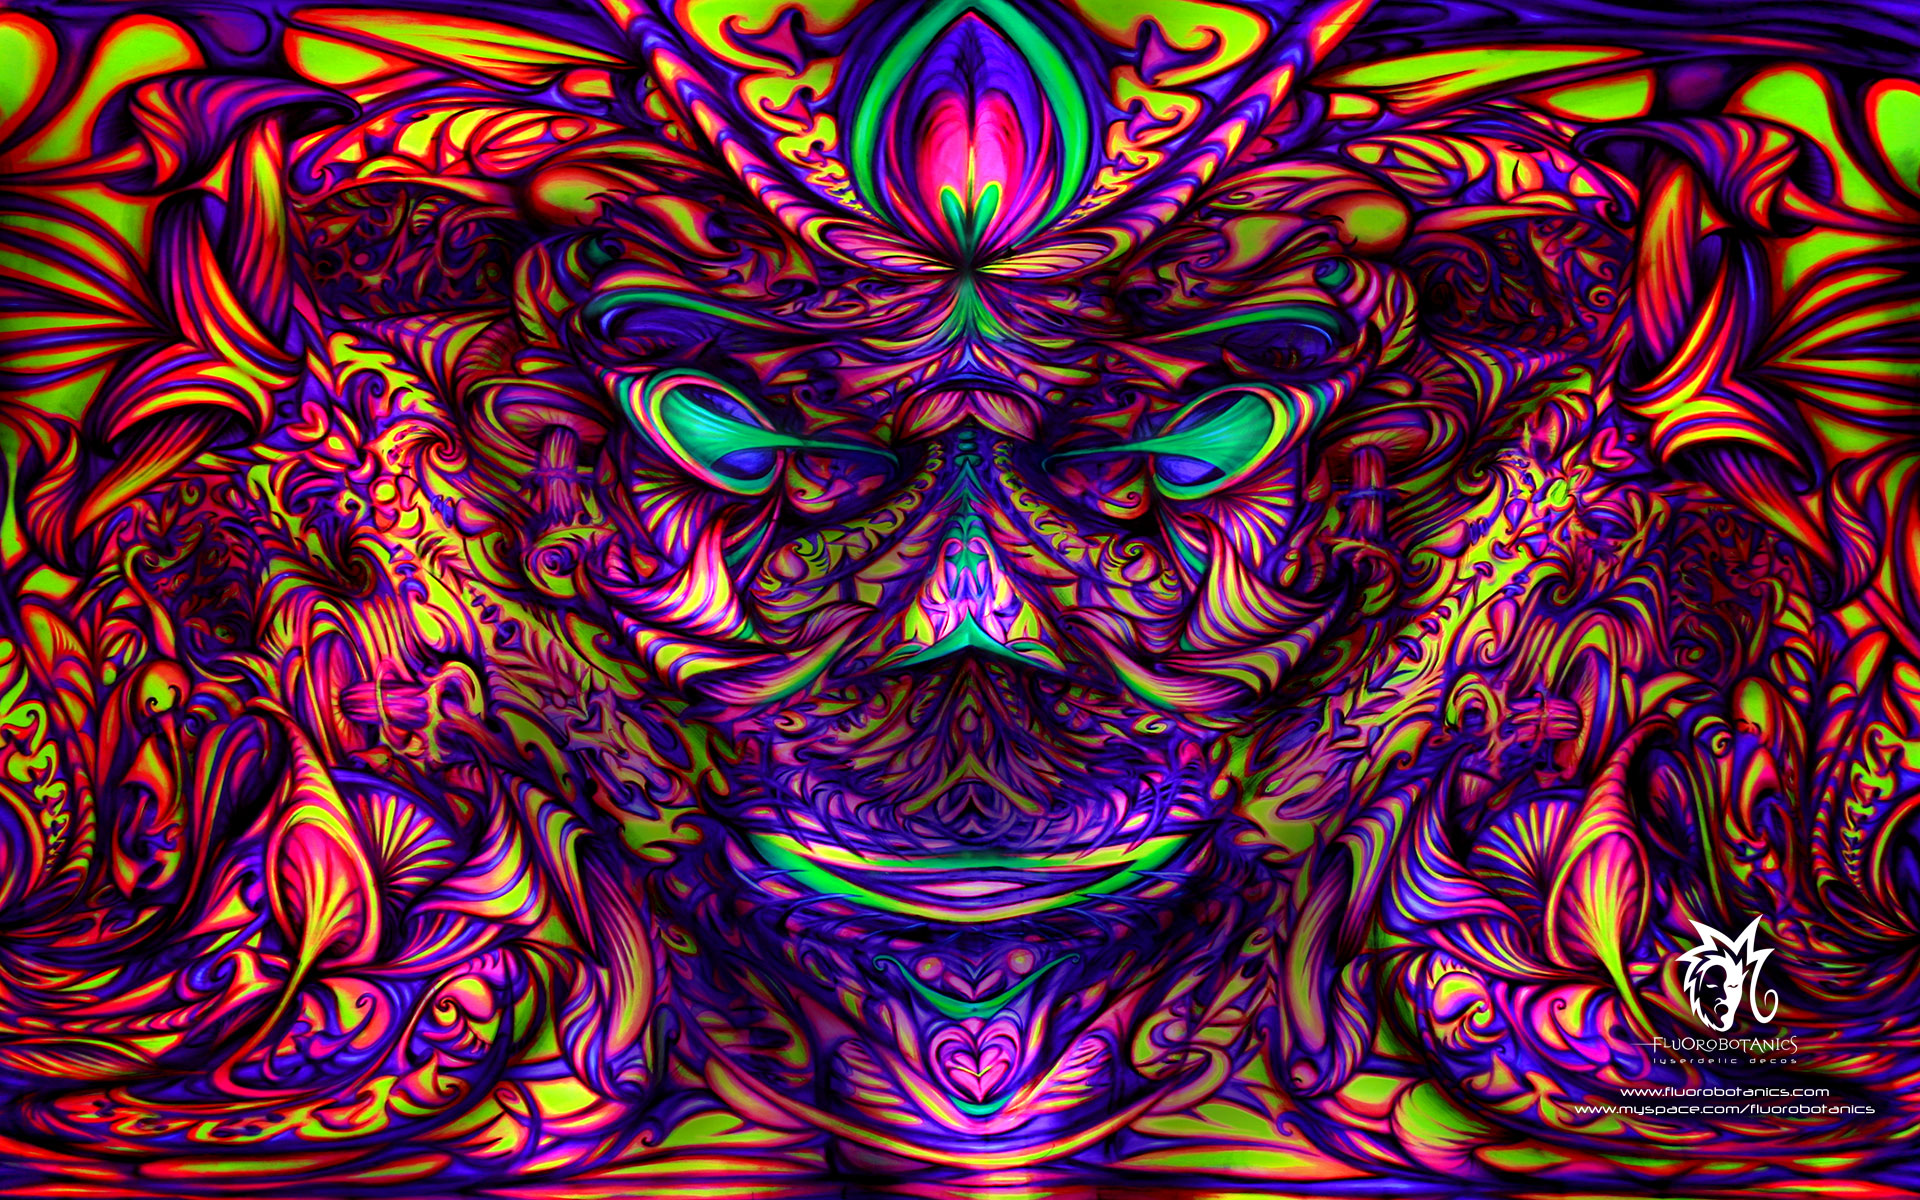 lsd medicine or madness essay